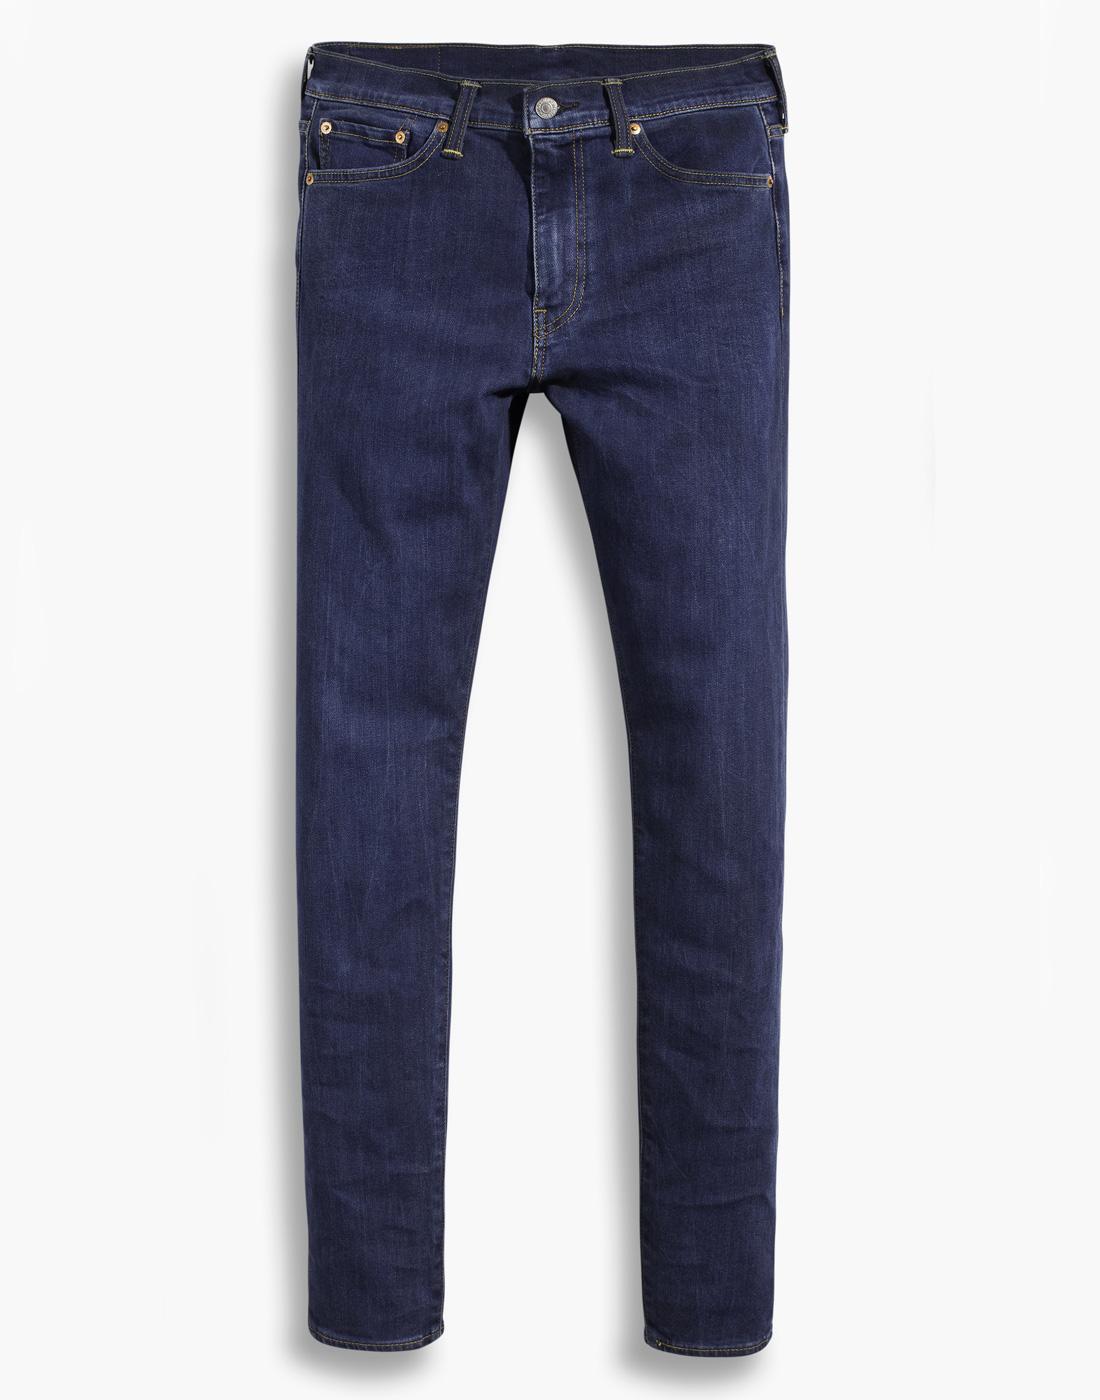 LEVI'S 510 Retro Mod Skinny Fit Denim Jeans CUZN